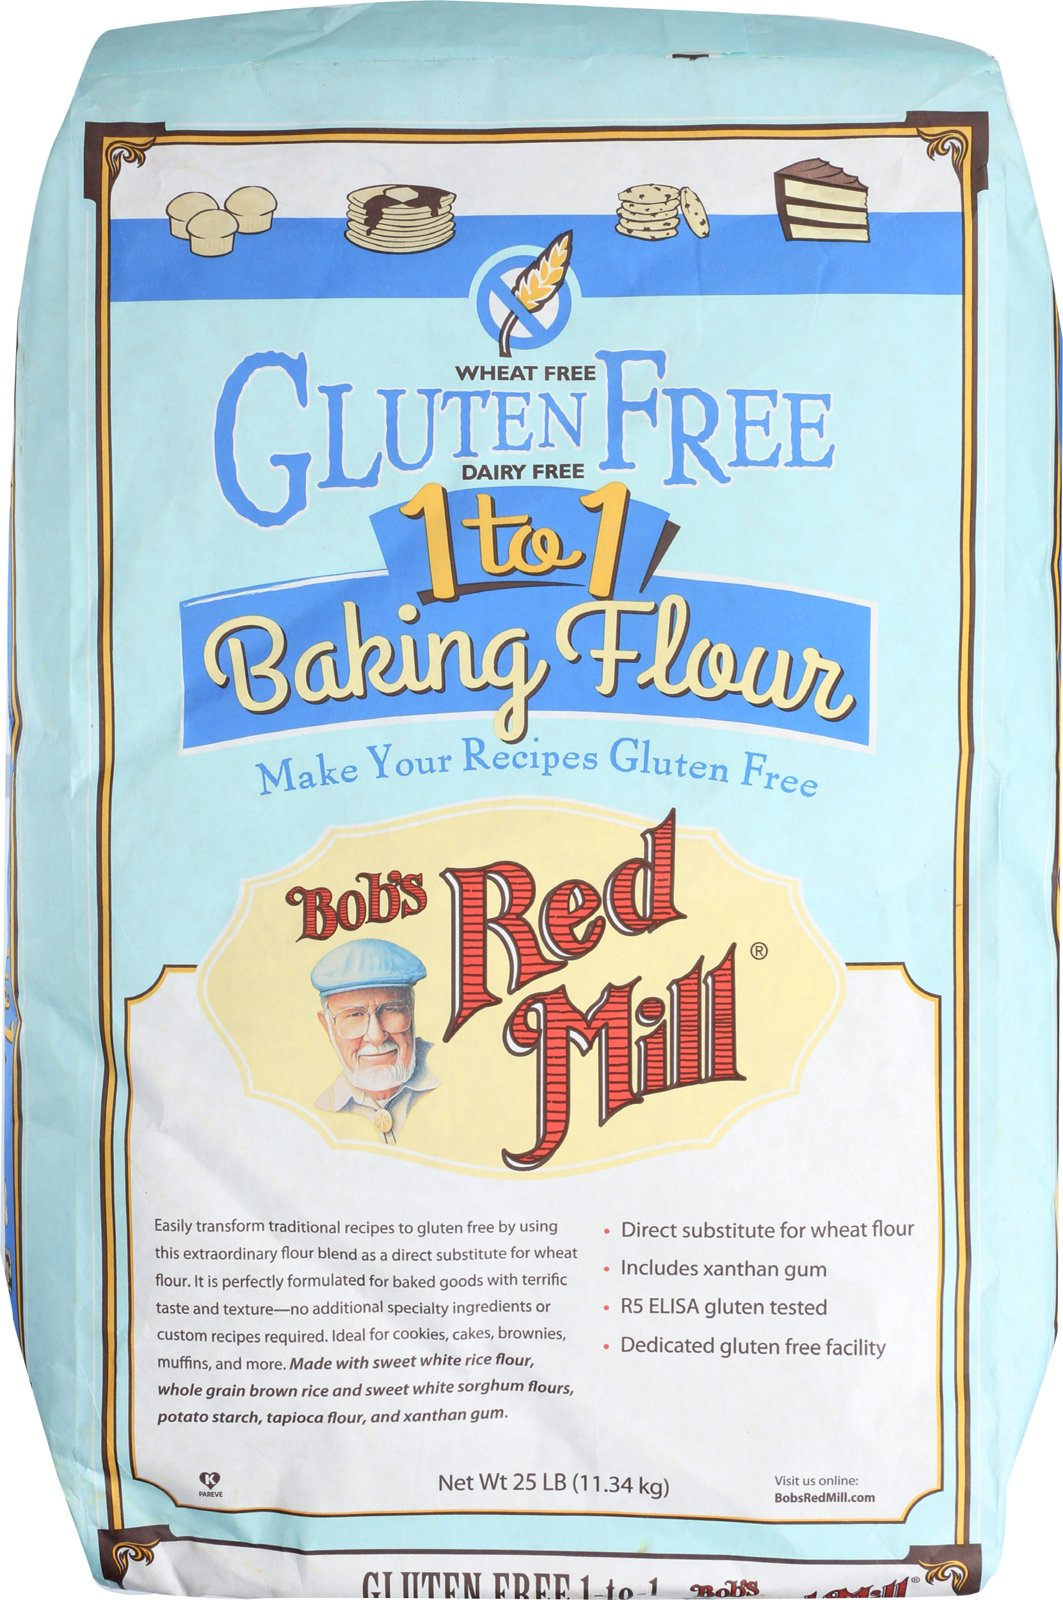 Bob's Red Mill Gluten Free 1-to-1 Baking Flour - 25 lb - Bulk Bag by Bob's Red Mill